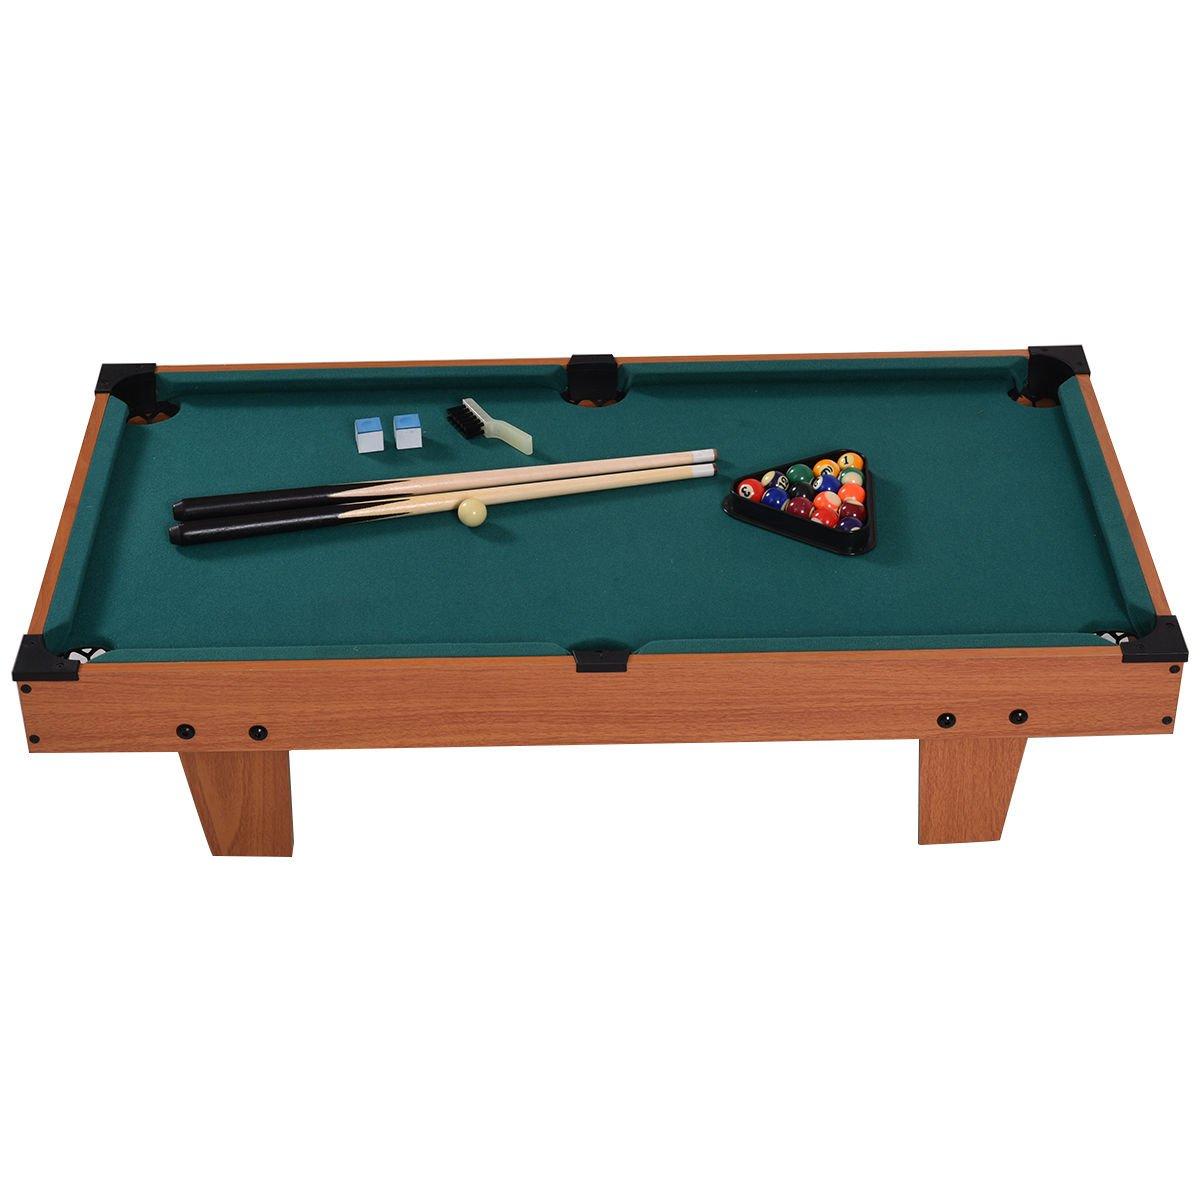 Amazon.com  Goplus Mini Pool Table Tabletop Billiard Game Set w/ Cues Balls 48  and 36  (Green 36 )  Sports u0026 Outdoors  sc 1 st  Amazon.com & Amazon.com : Goplus Mini Pool Table Tabletop Billiard Game Set w ...